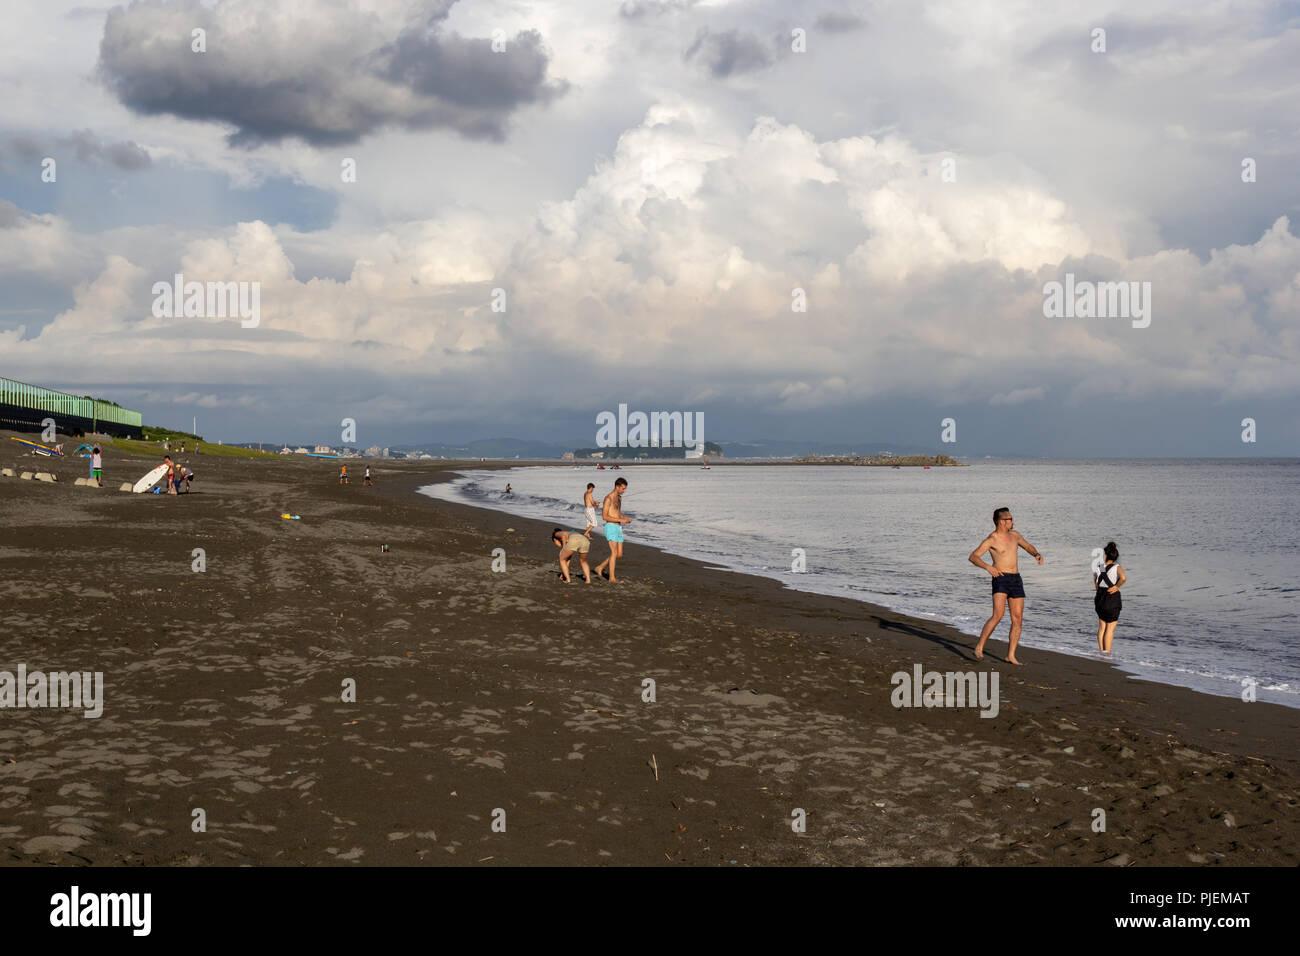 People on the beach; Chigasaki, Kanagawa Prefecture, Japan - Stock Image